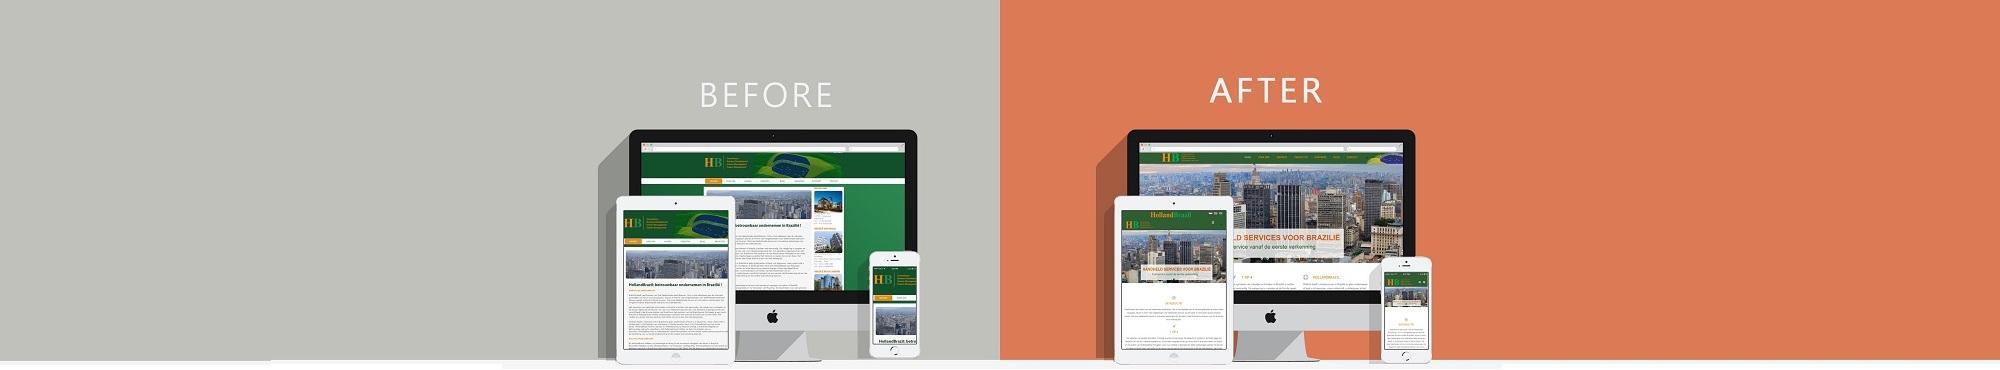 before-after holland brazil website